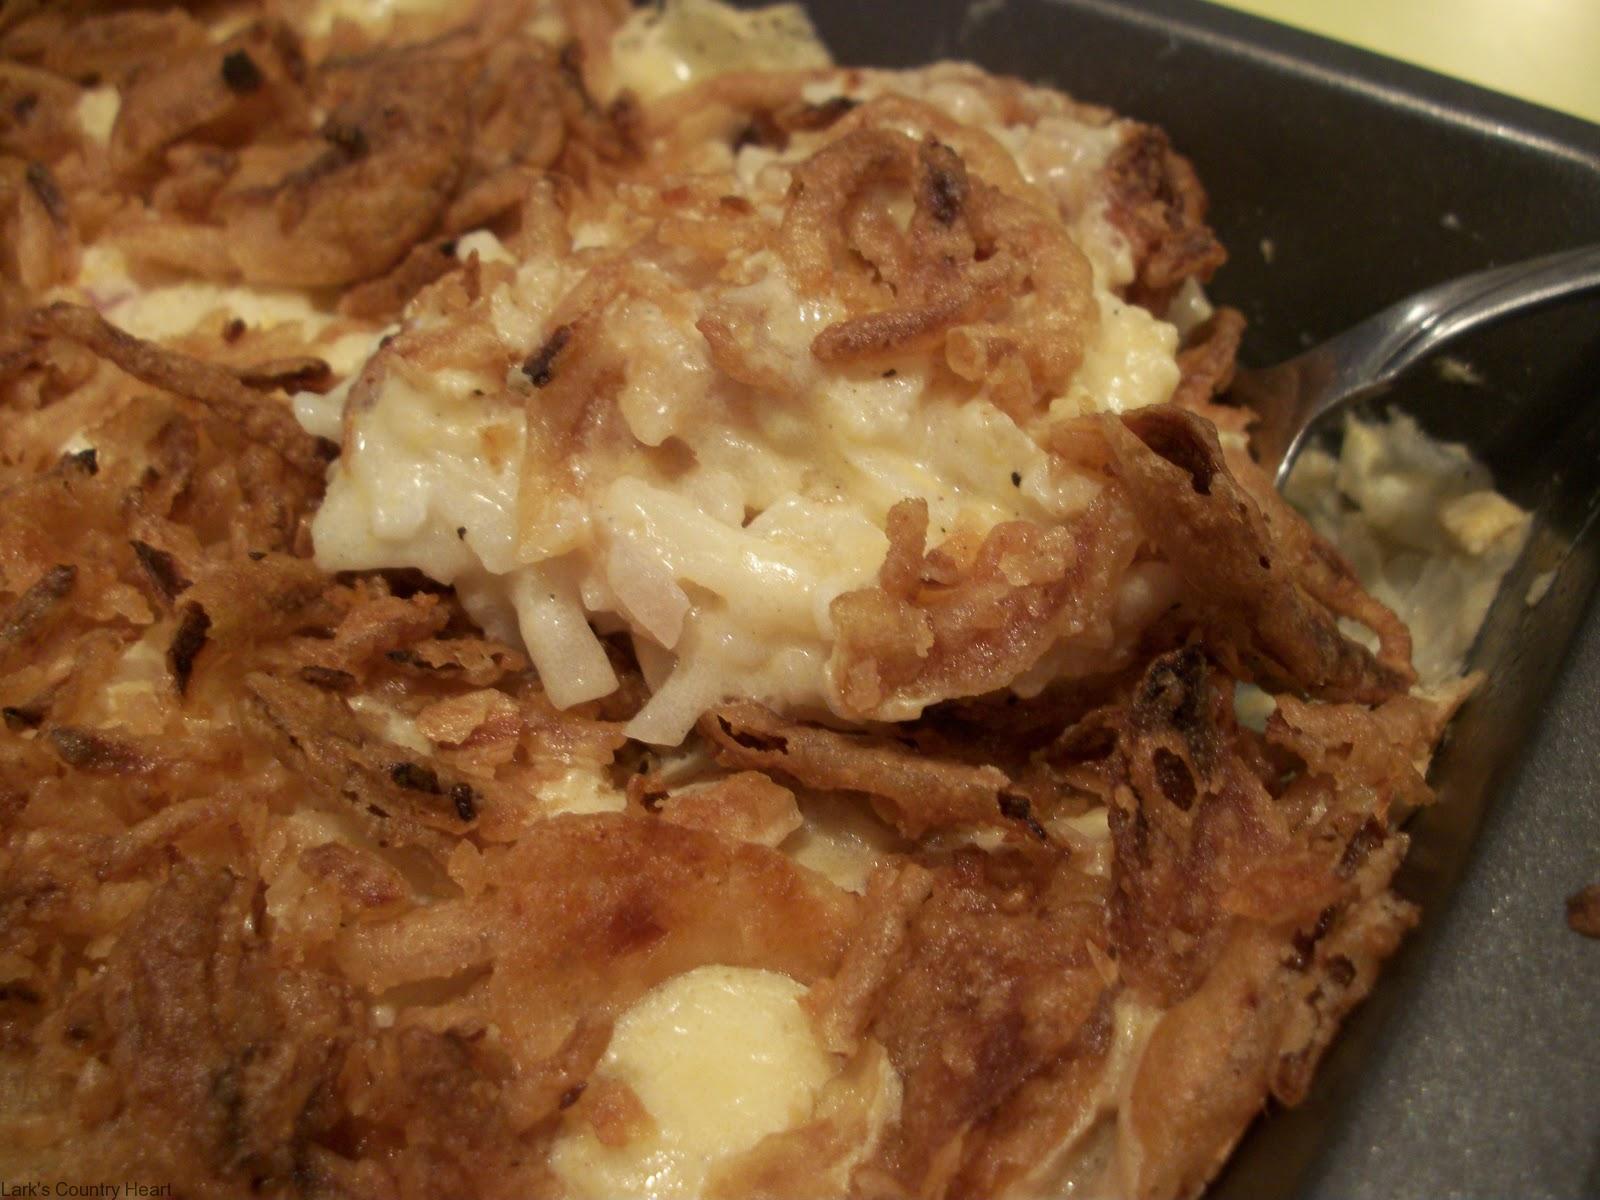 Potatoe Supreme